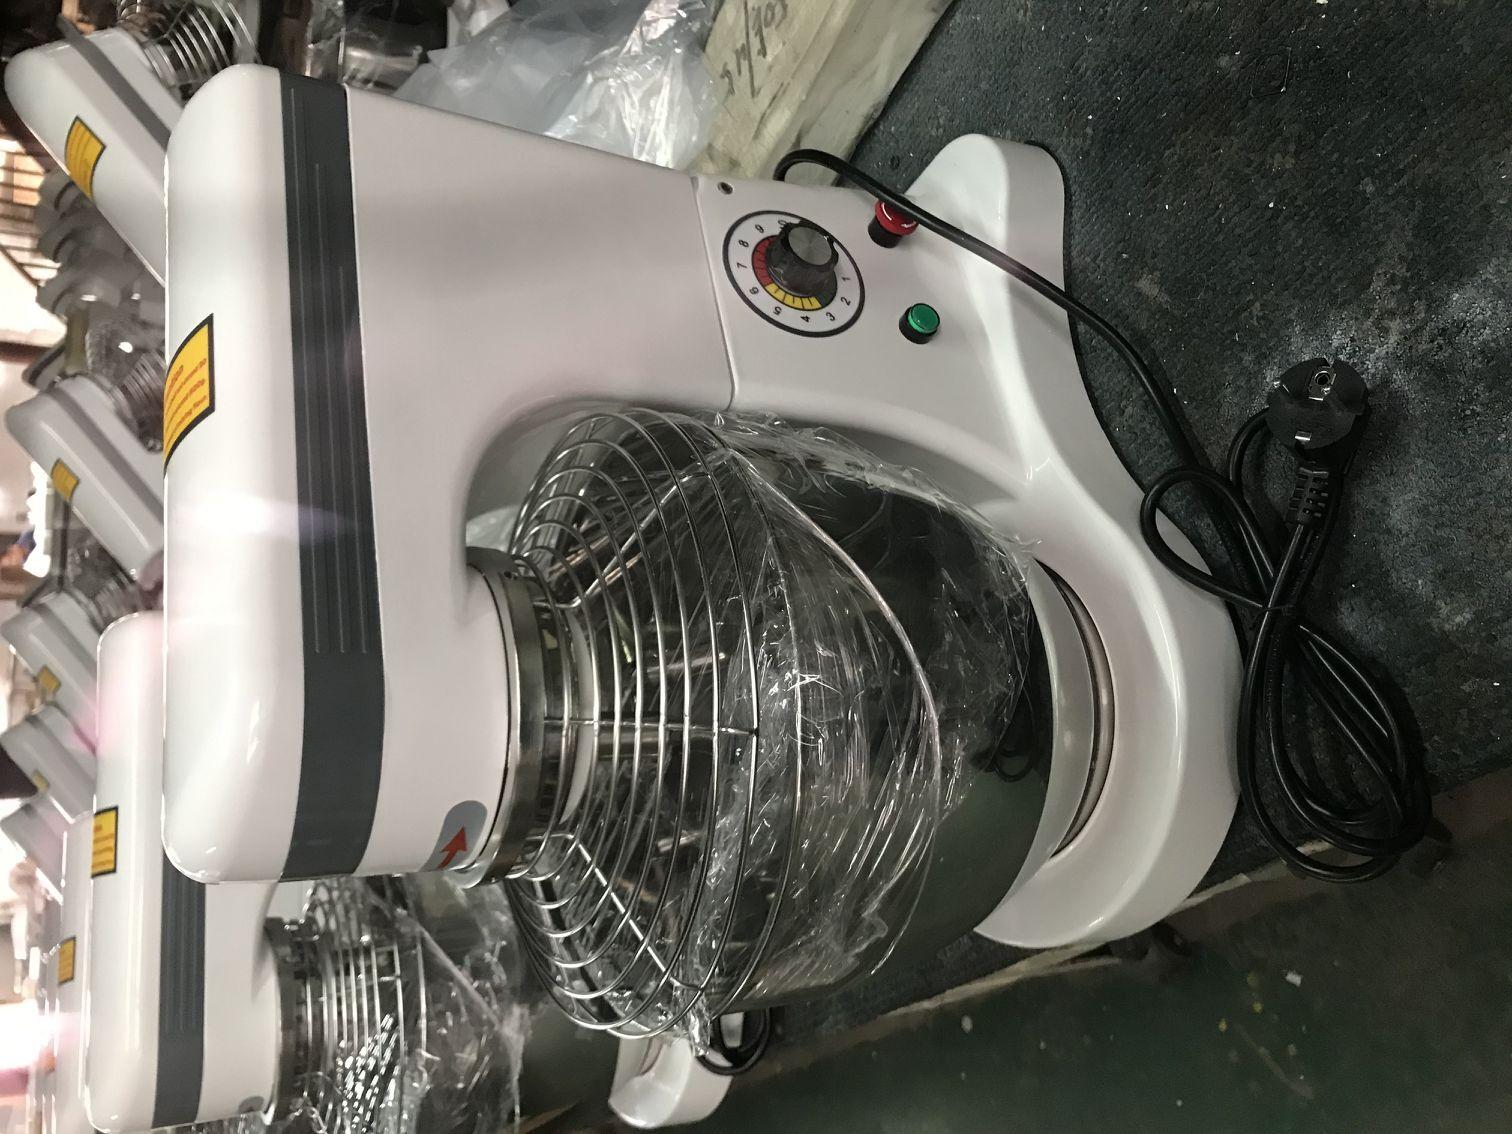 Linkrich B7 Hot Sale Bakery Cake Mixer 7L Stand Food Mixer